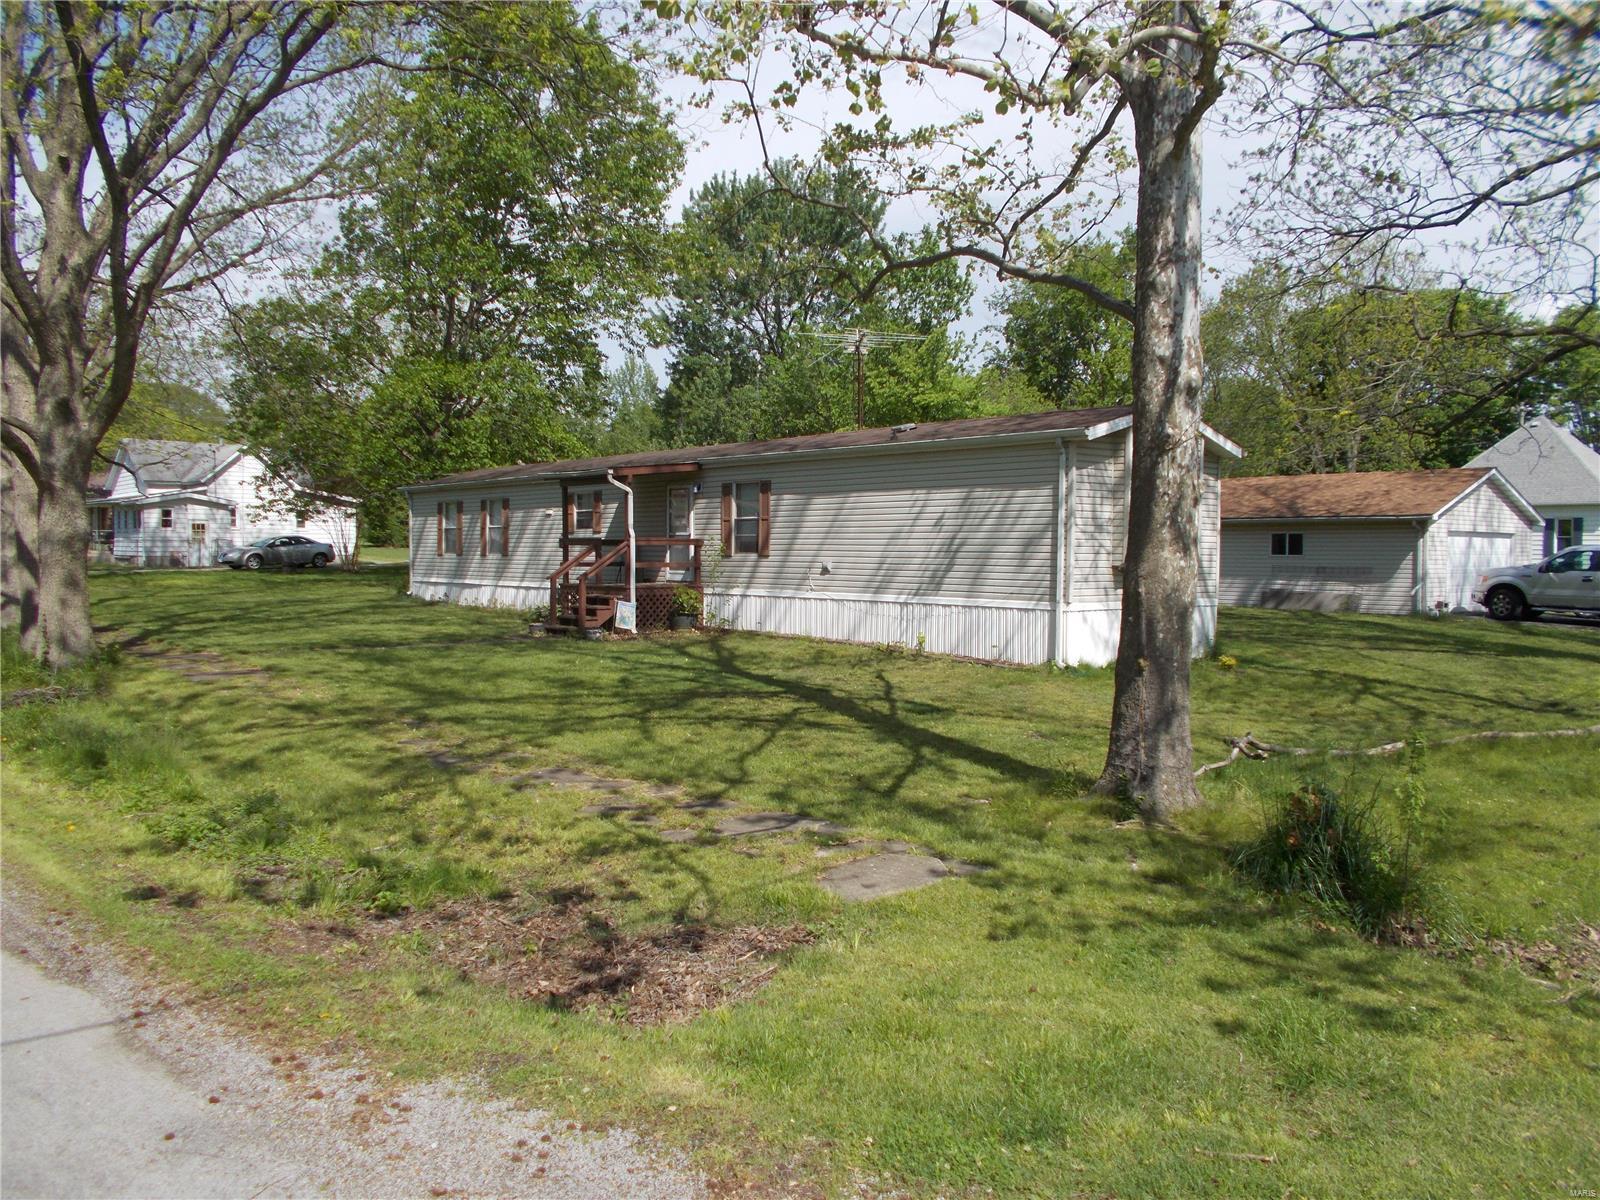 111 E Vine Property Photo - Coulterville, IL real estate listing